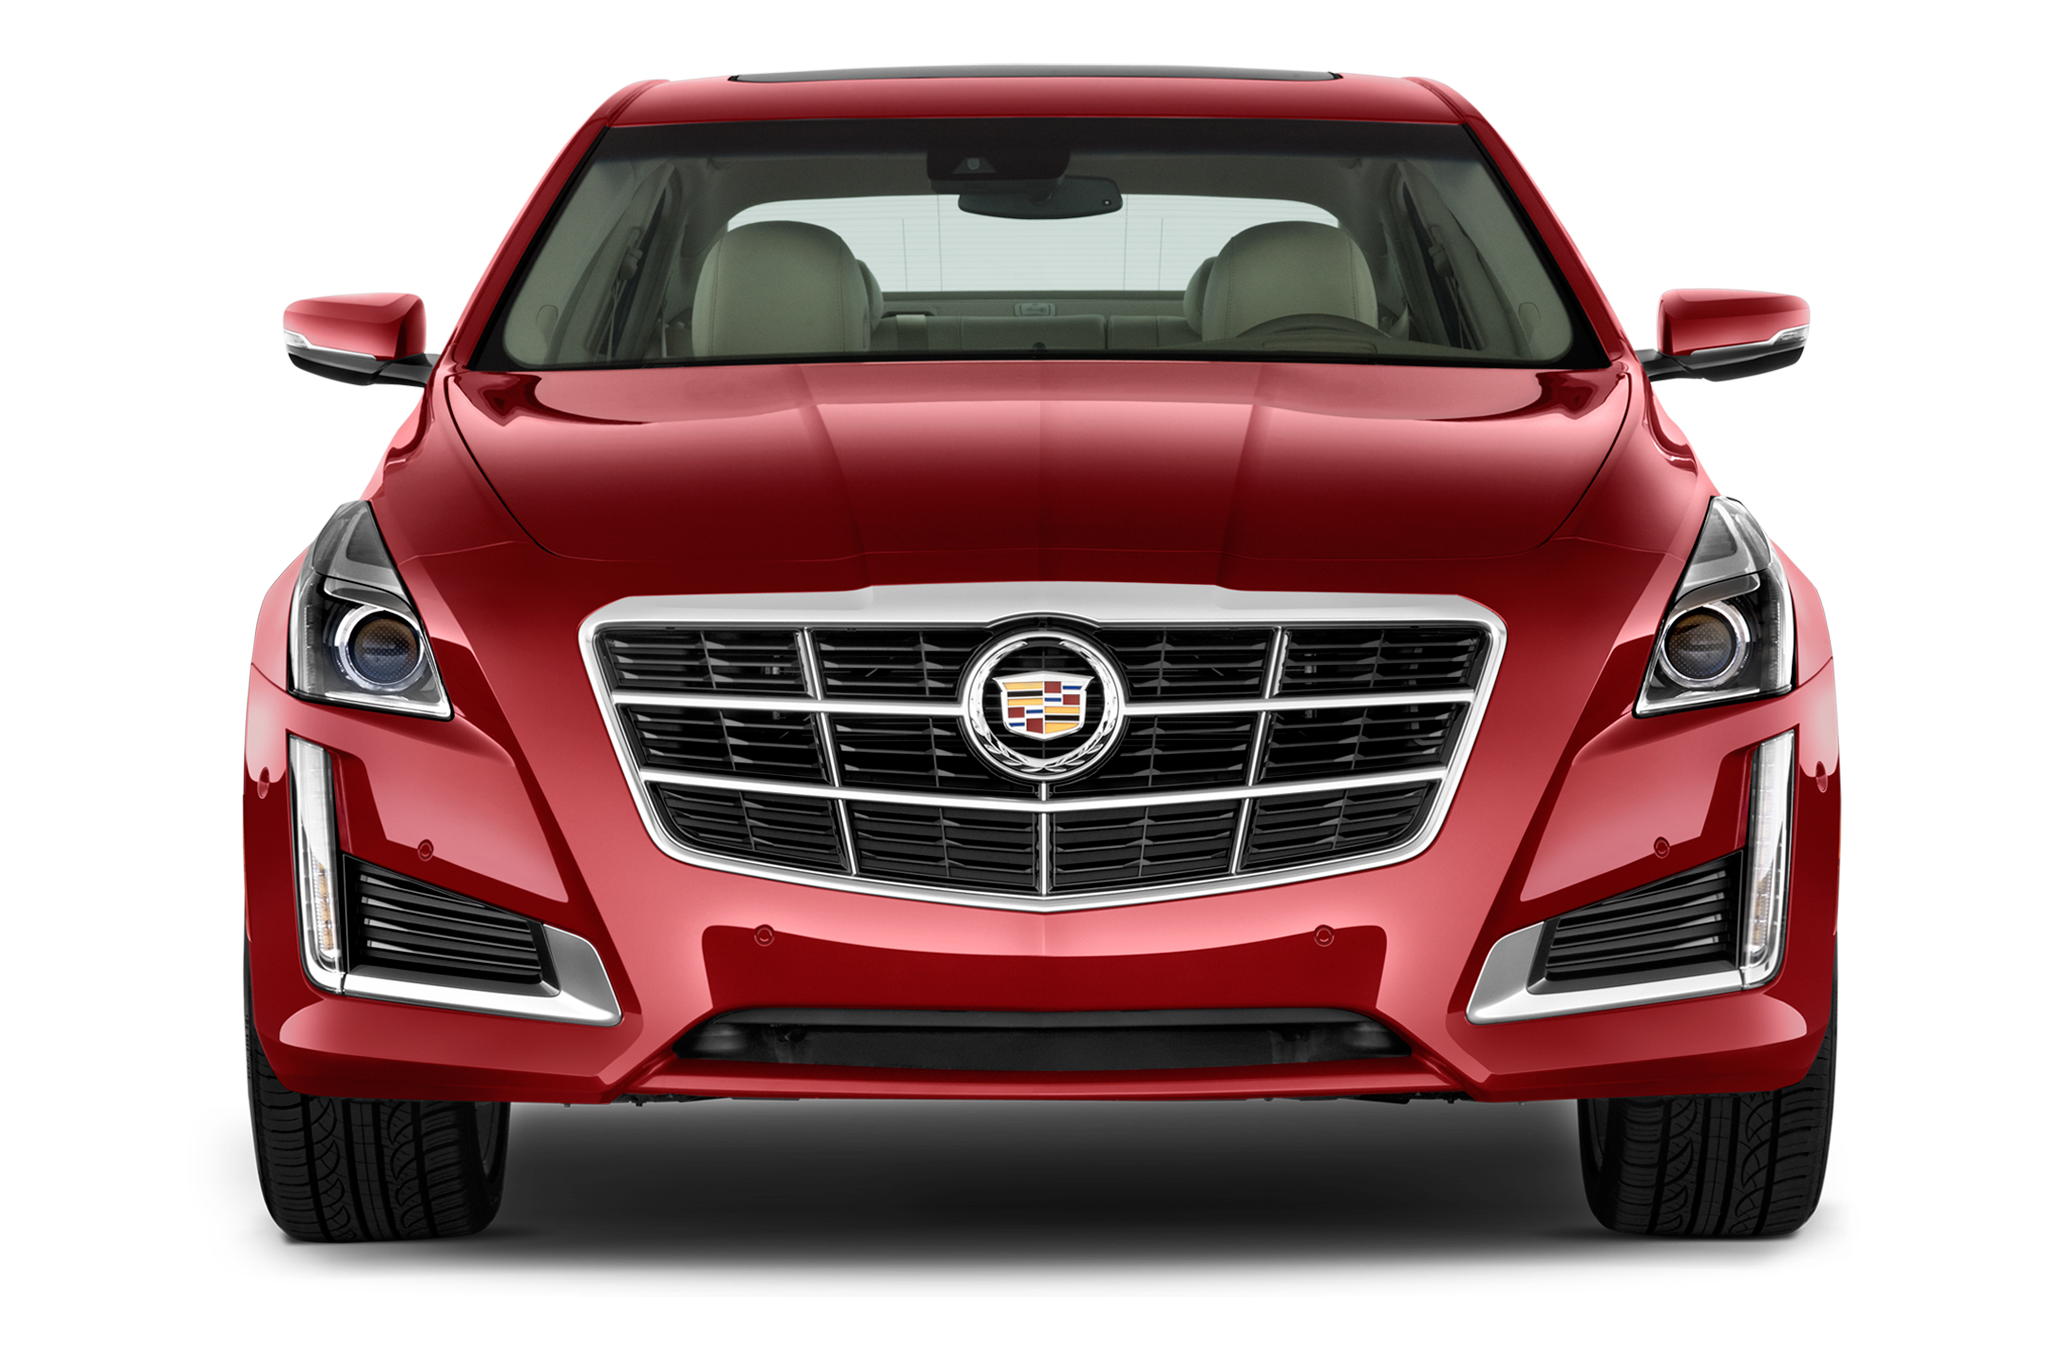 Cadillac Cts Sedan 3 6 Tt Rwd V Sport Premium 2014 International